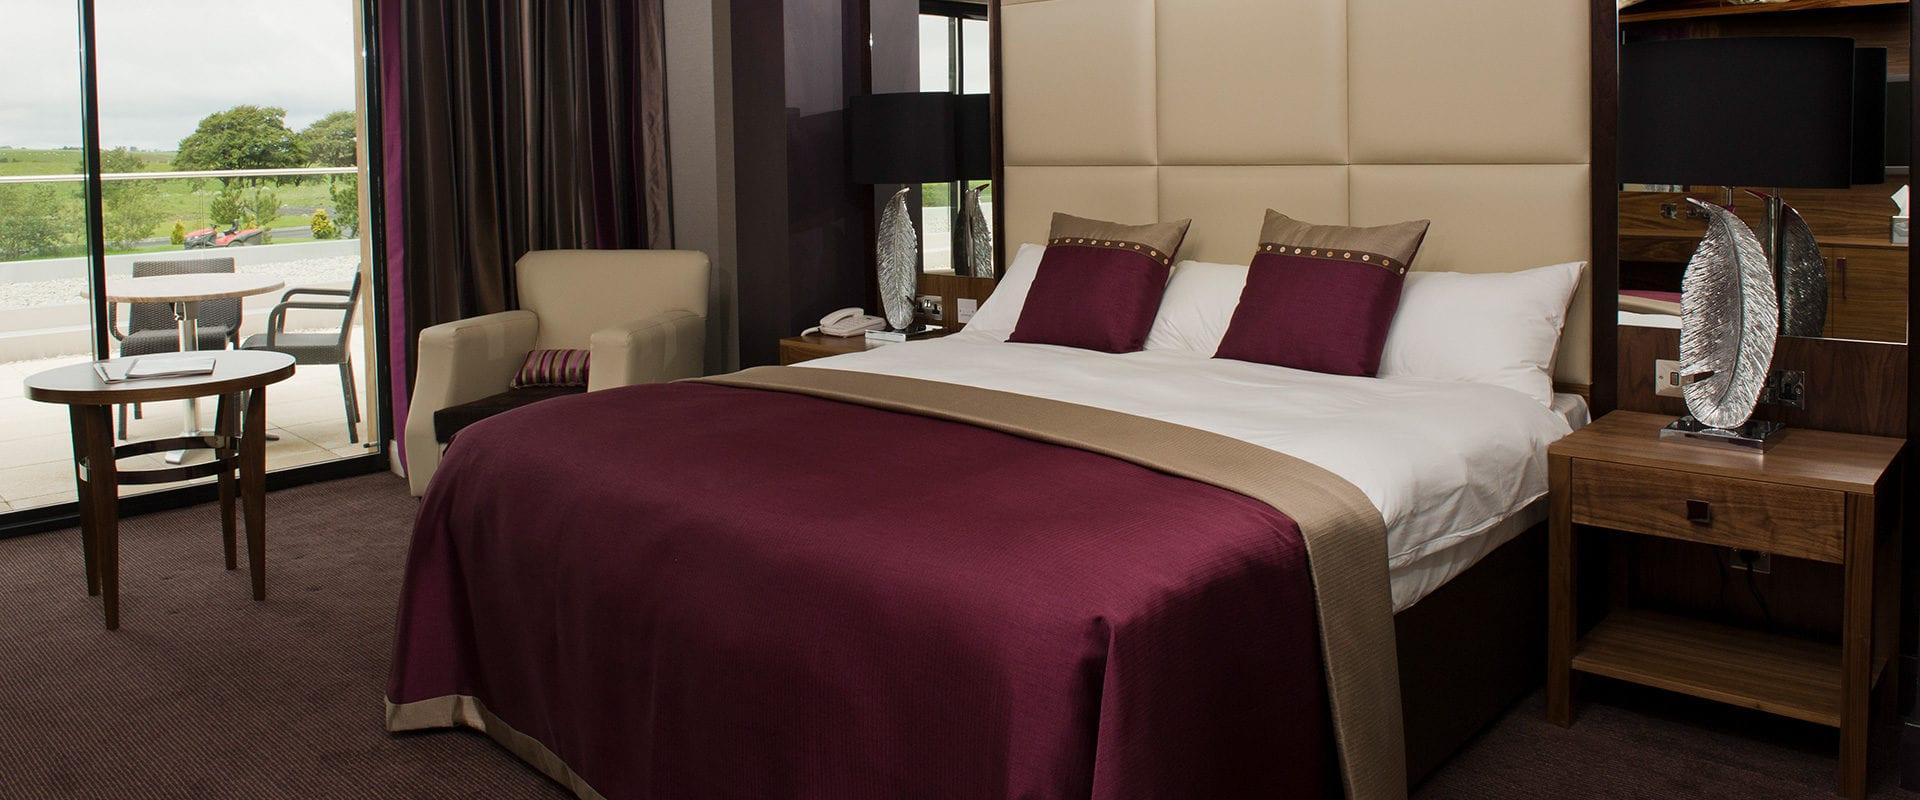 Lochside House Hotel